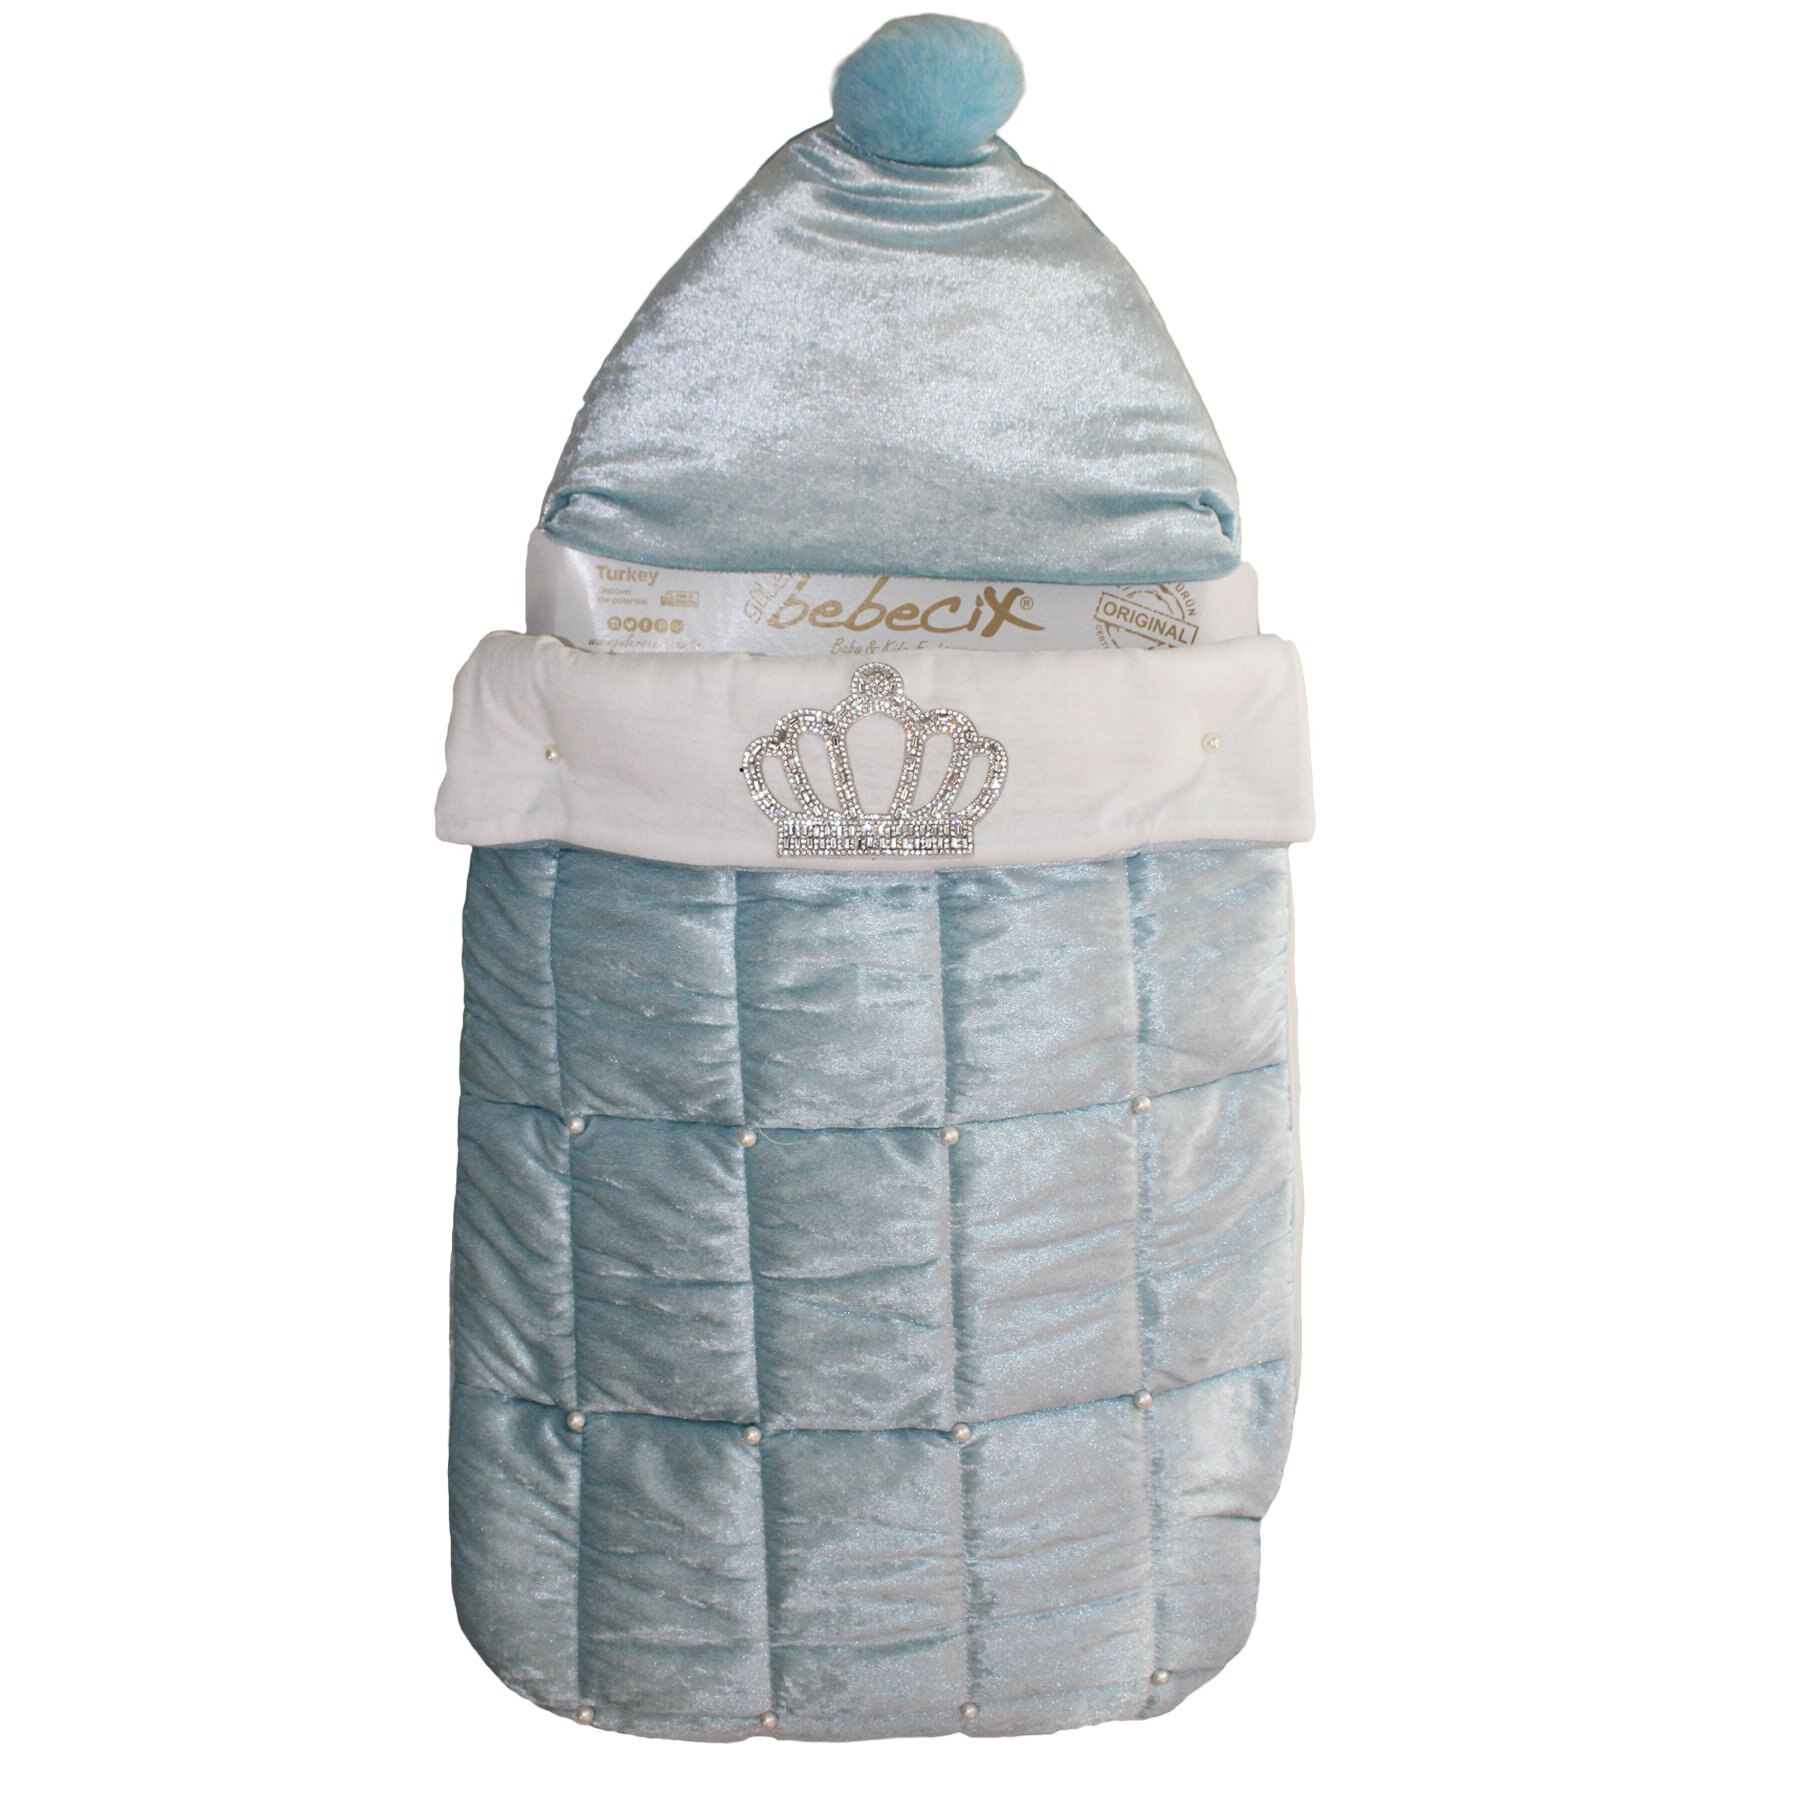 Newborn Cotton Baby Receiving Blanket Blue Crowned and Pearl Baby Boy Swaddle Cartoon Cute Infant Sleeping Bag Kids Blanket